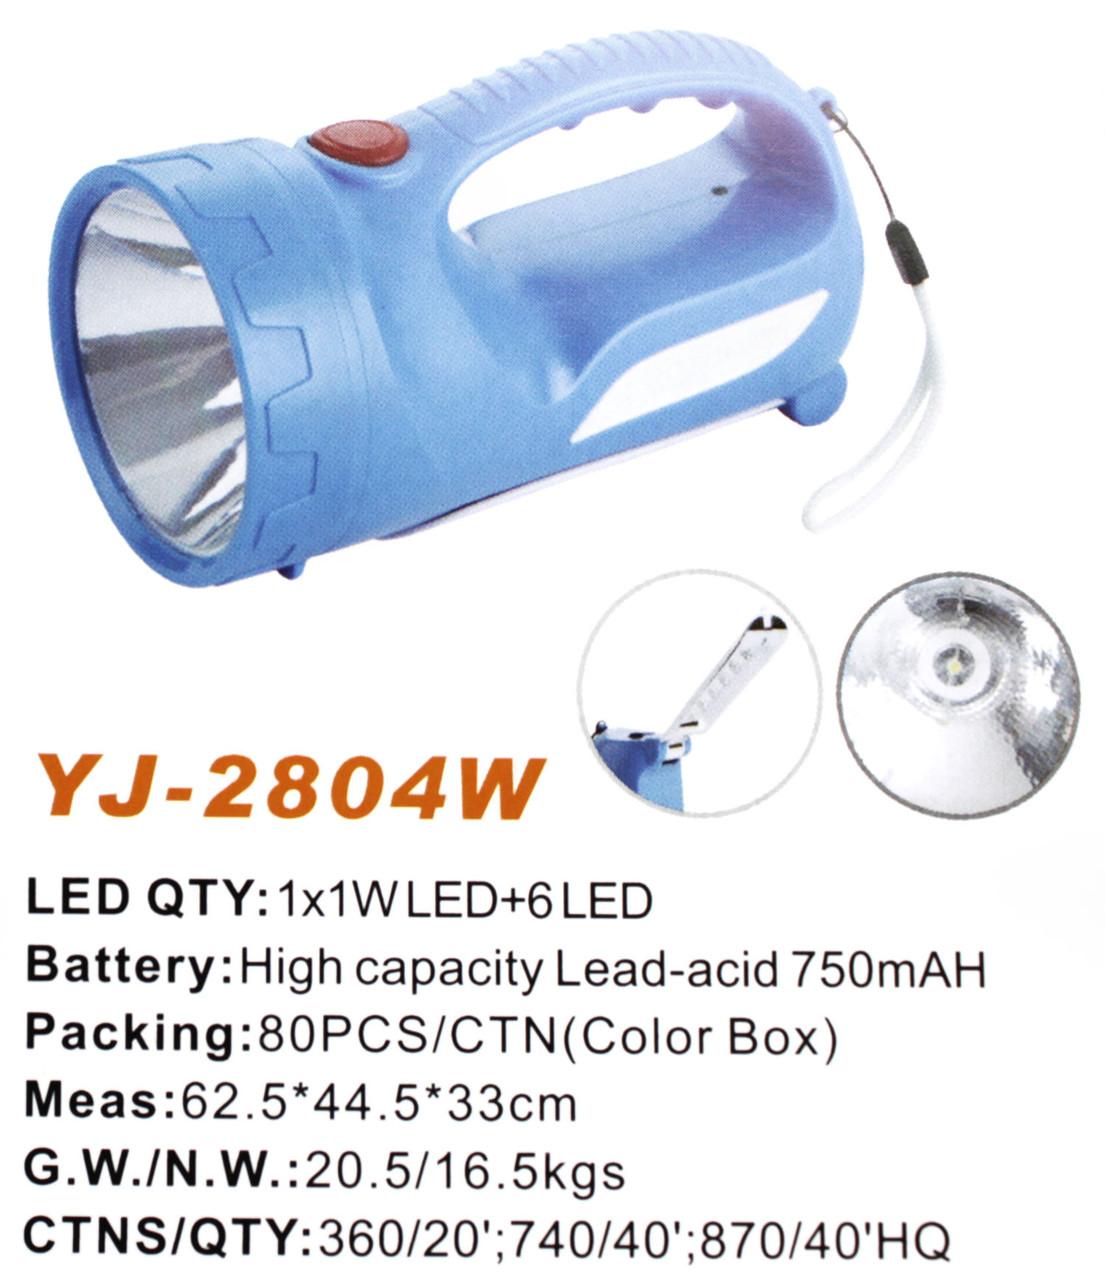 Фонарь Yajia YJ-2804W/Акк./ 1LED + 8 LED/ Боковая подсветка/